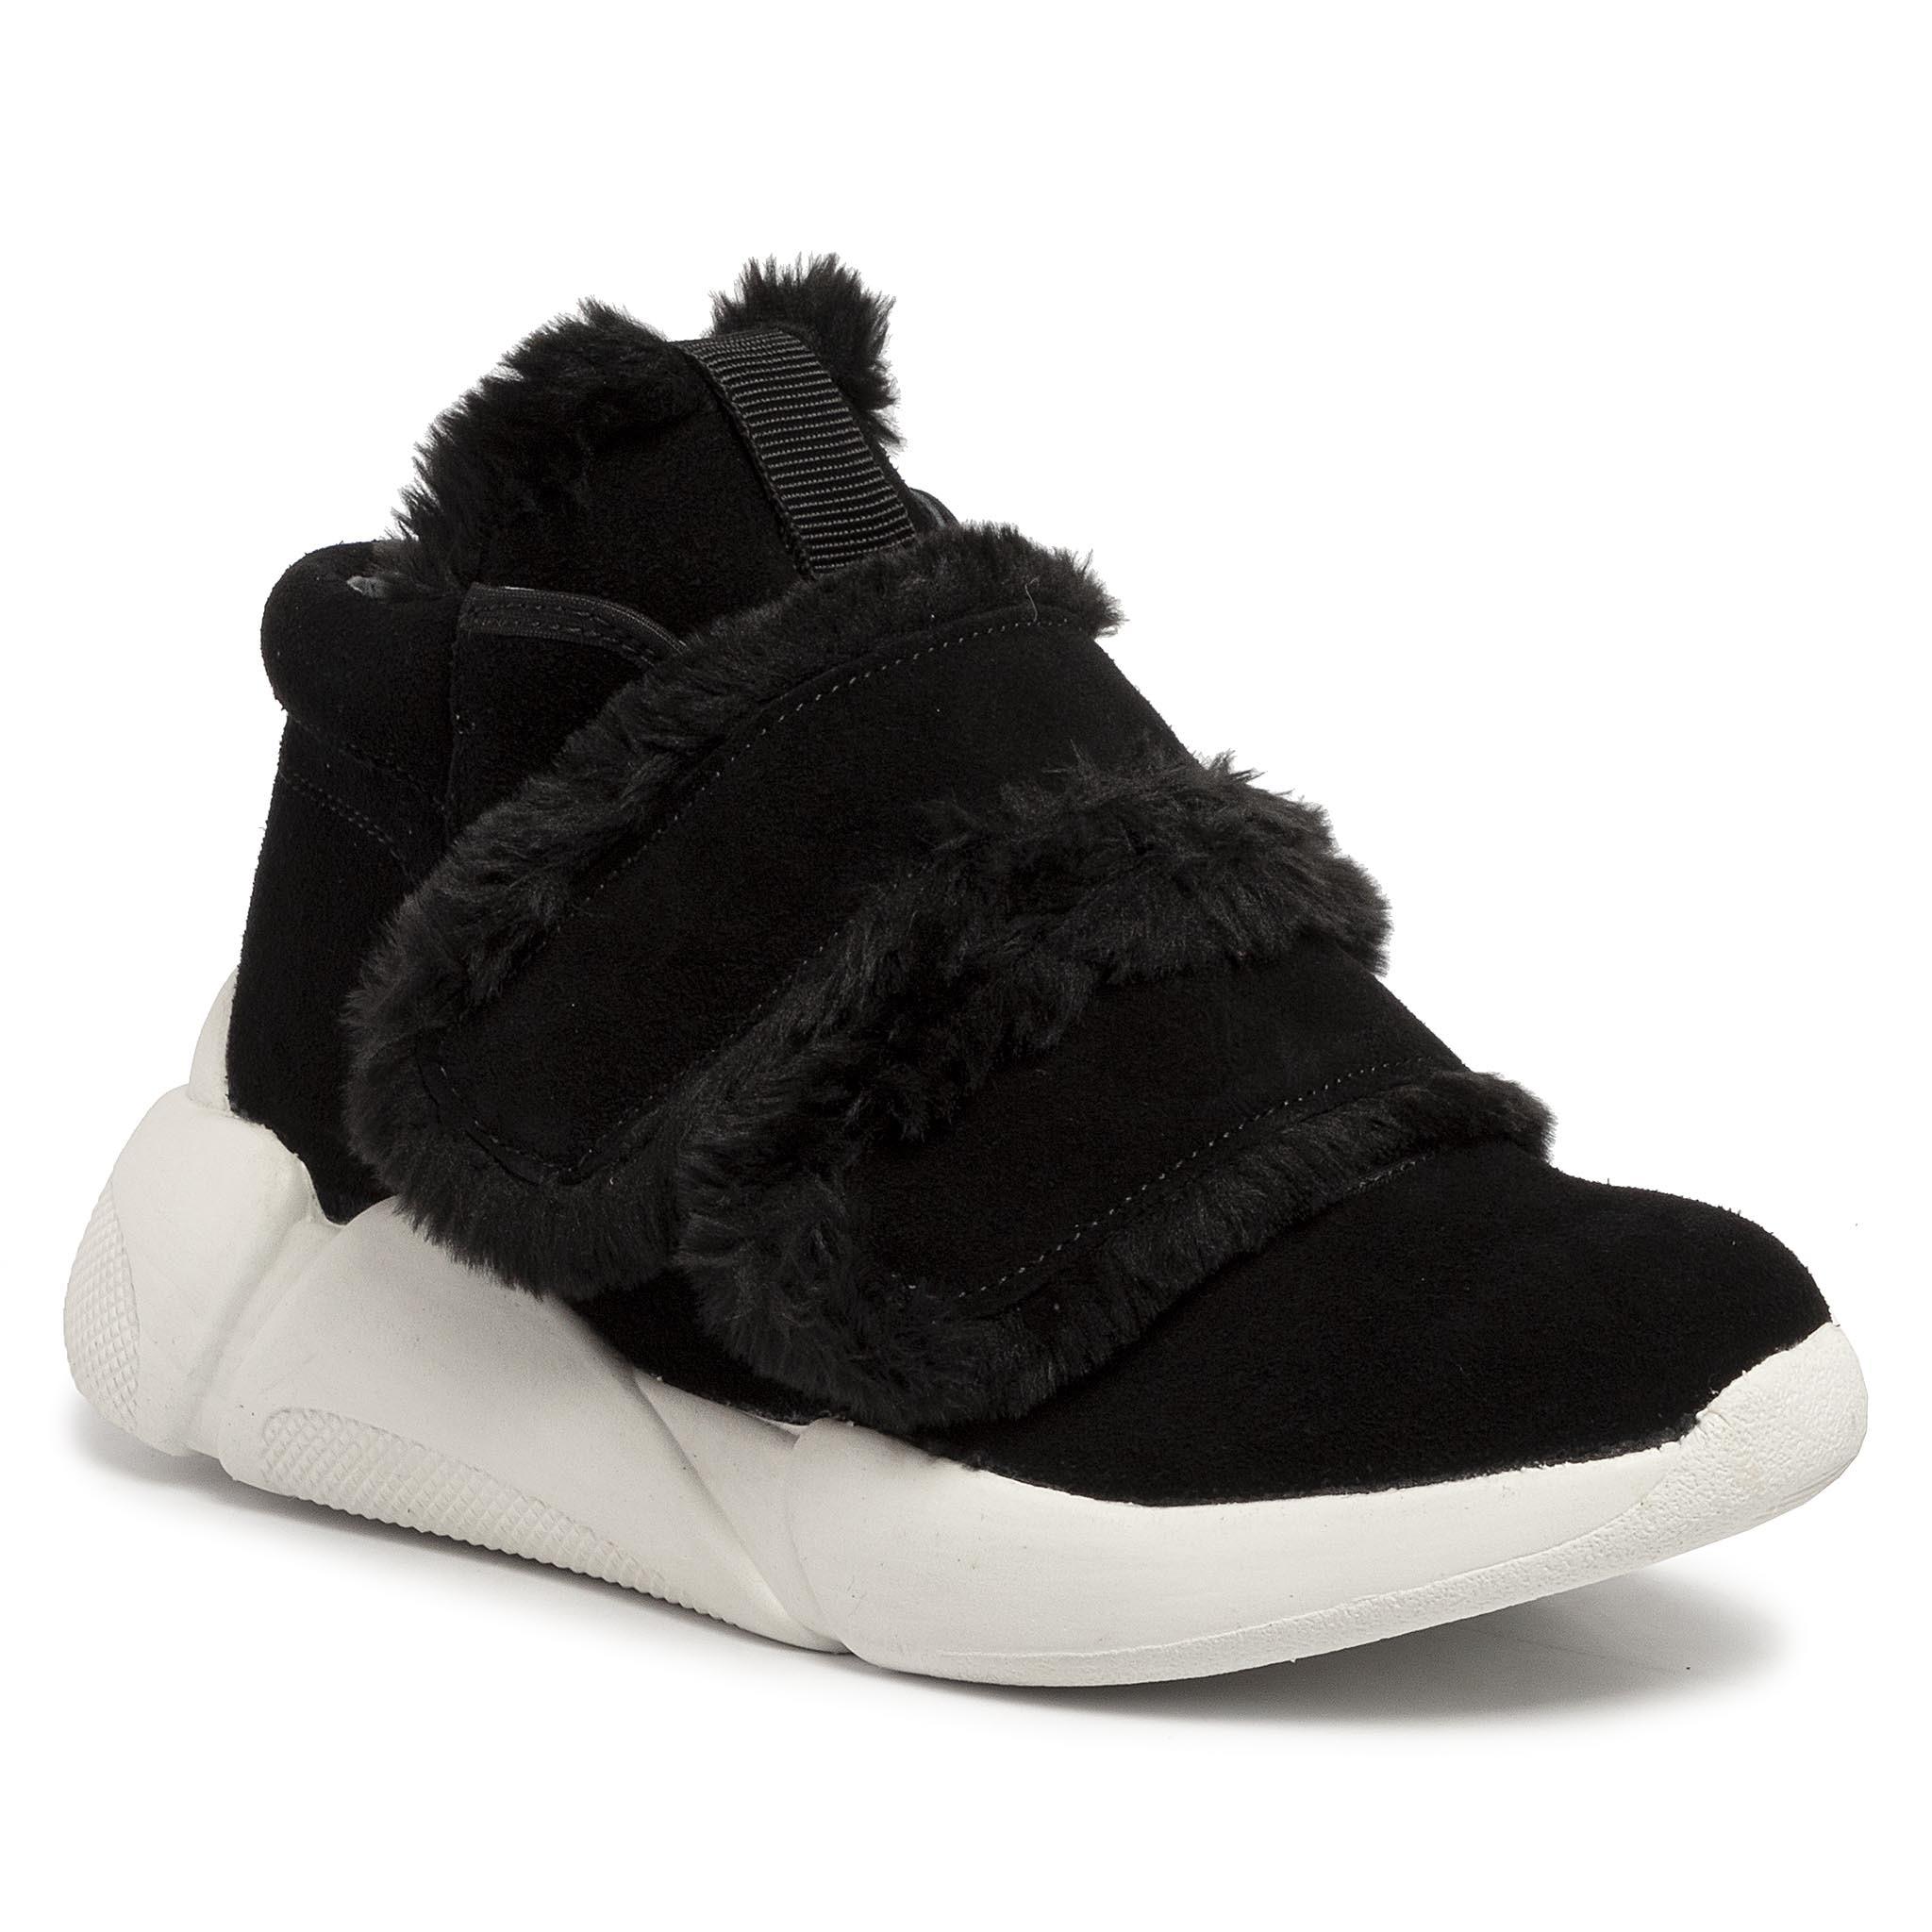 Sneakers COLORS OF CALIFORNIA - HC.YFURSNK02 Black